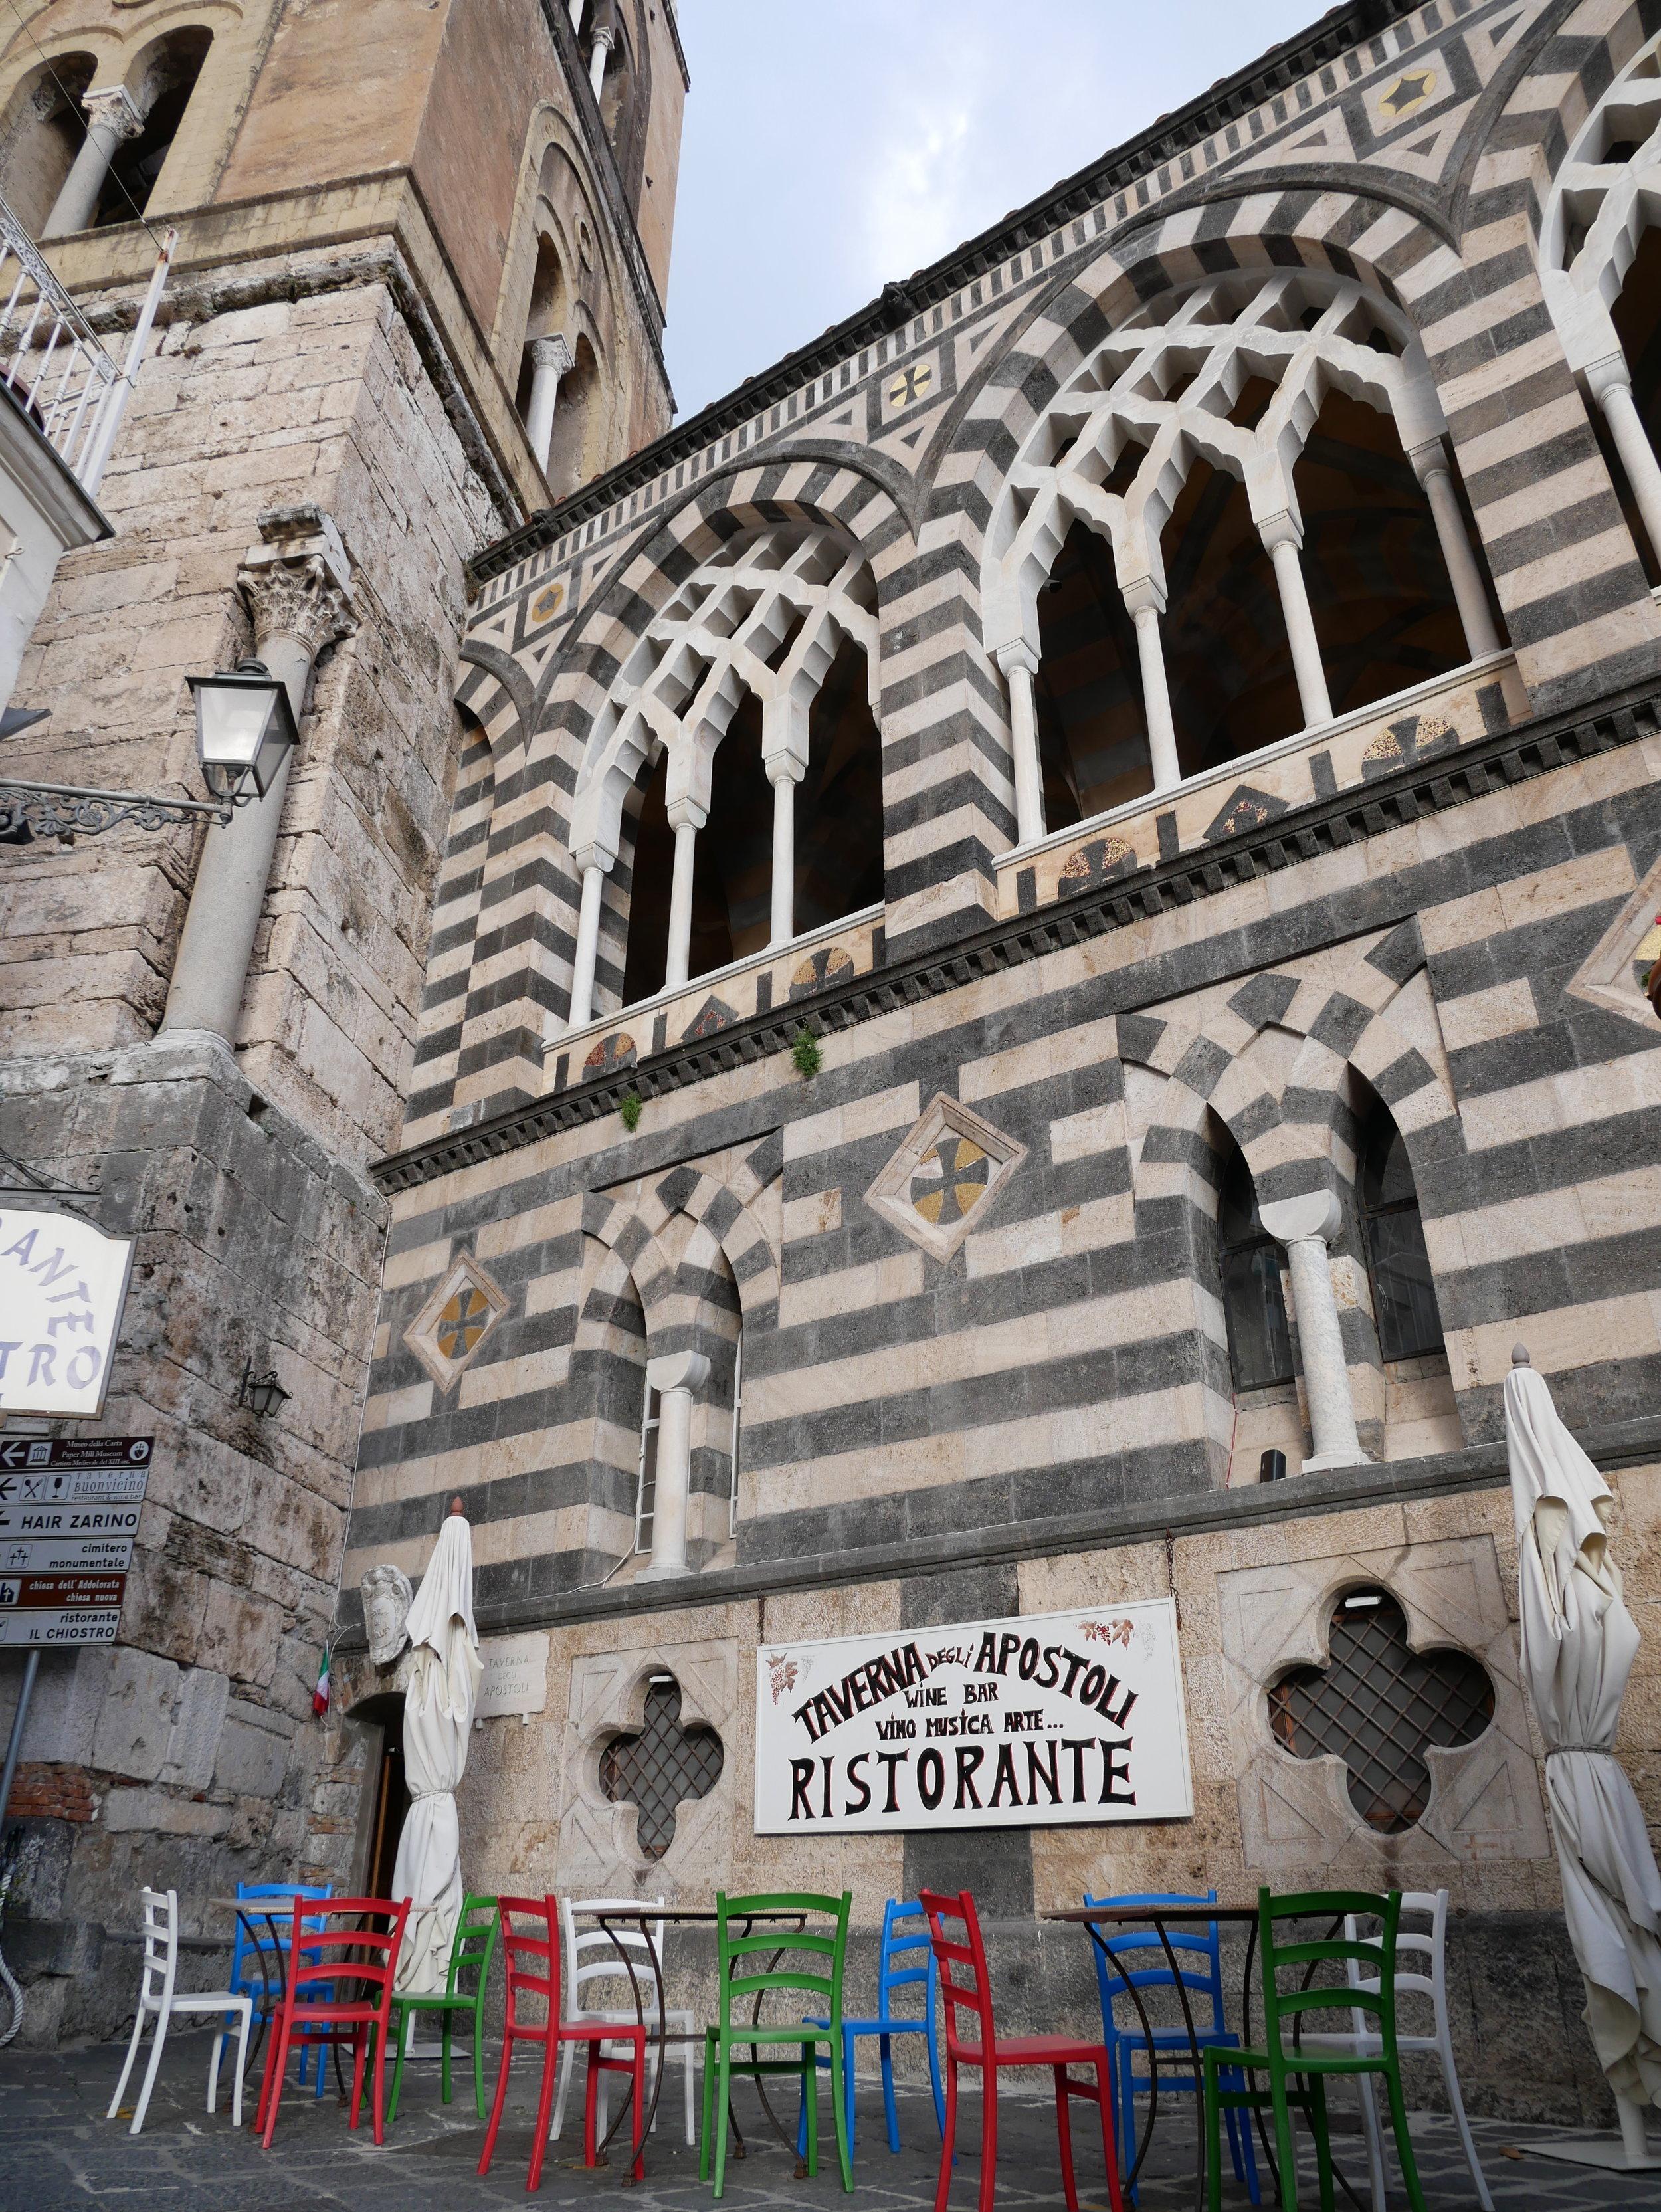 Ristorante Taverna degli Apostoli